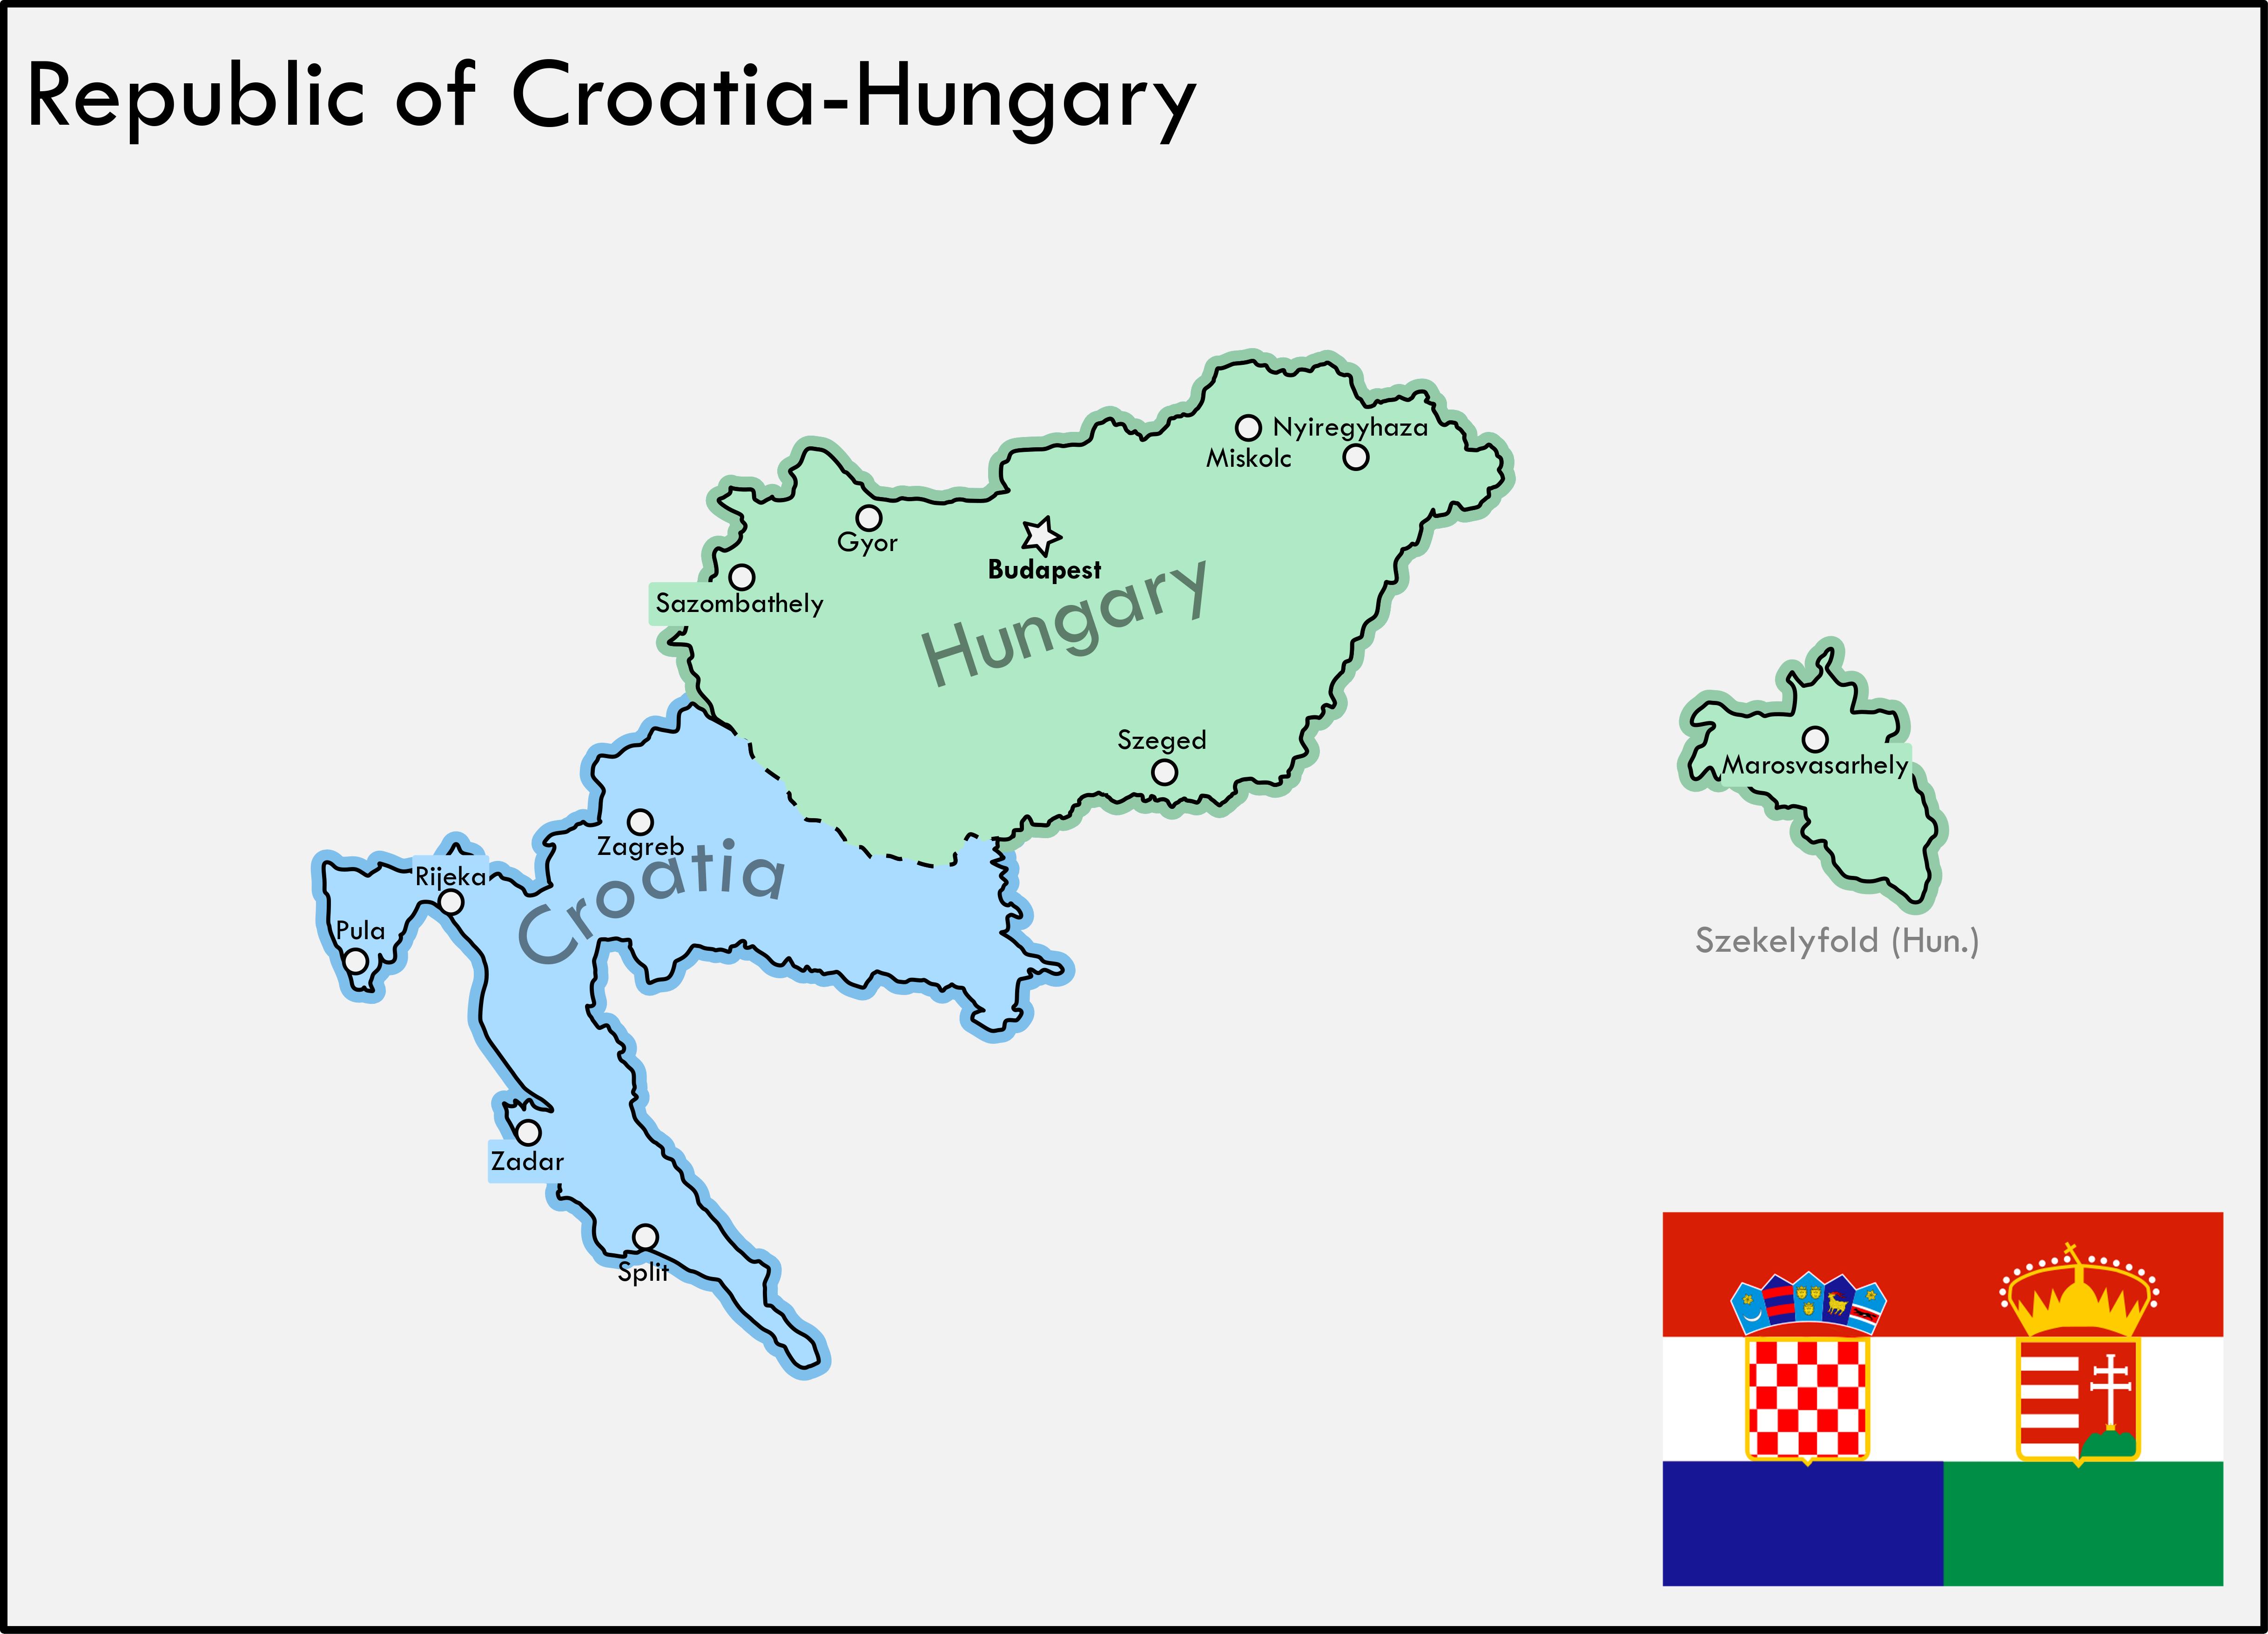 Republic Of Croatia Hungary Imaginary Maps Fantasy Map Historical Maps